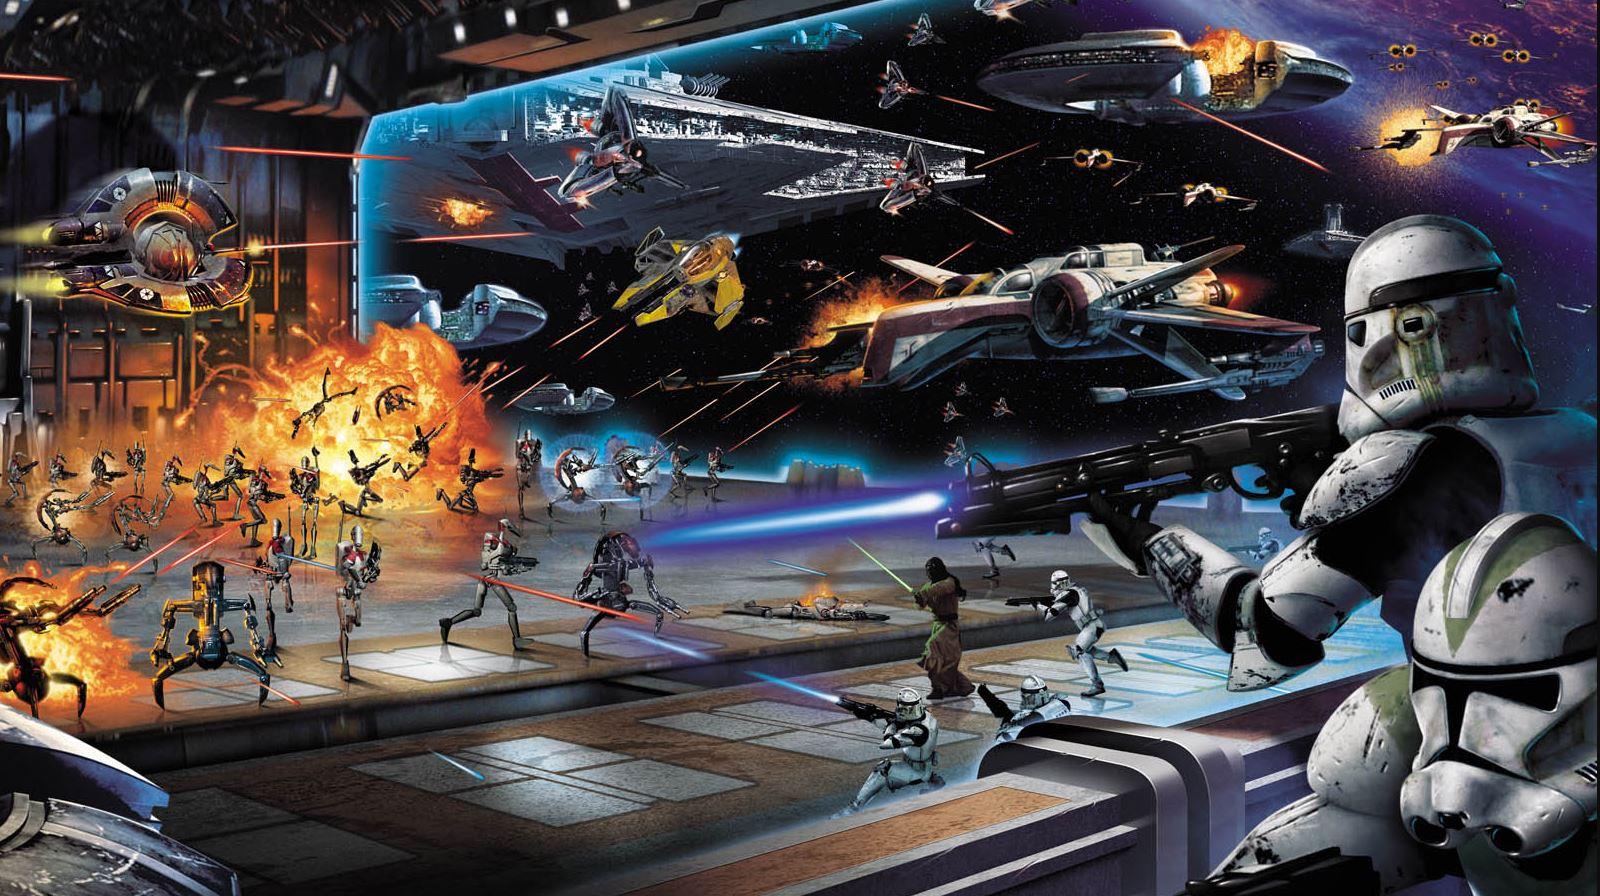 star wars battlefront pc download free